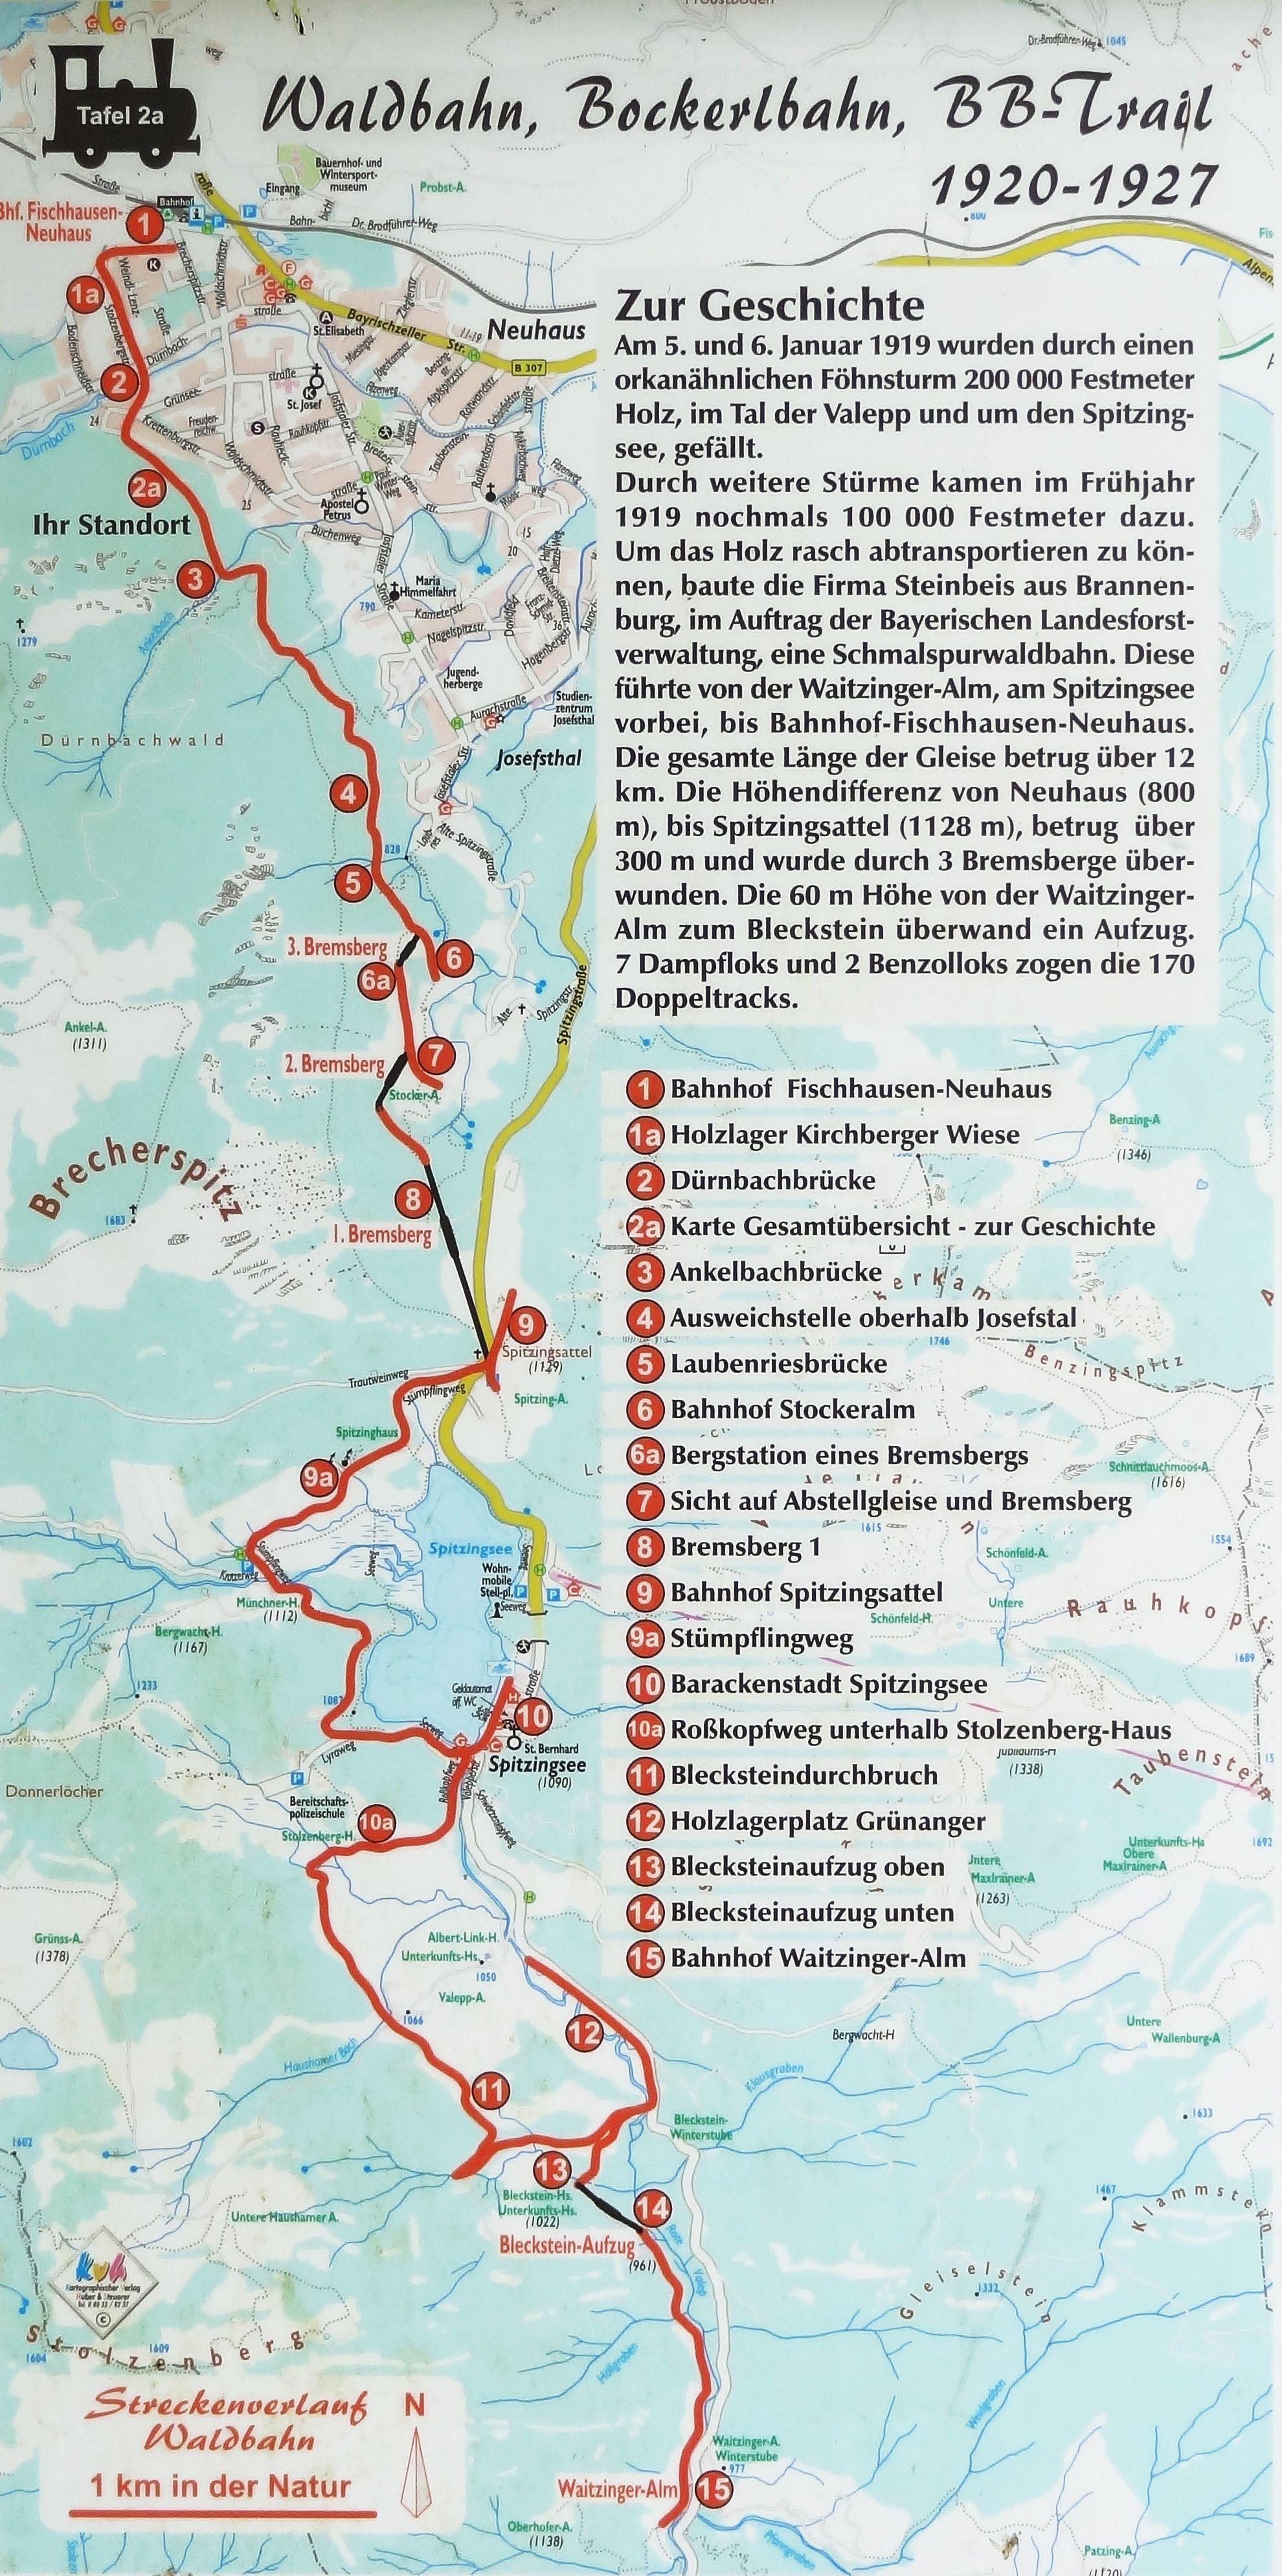 Bockerlbahnweg Am Spitzingsee Wanderung Von Der Valepp Nach Neuhaus Spitzingsee Wandern Bayern Bergtouren